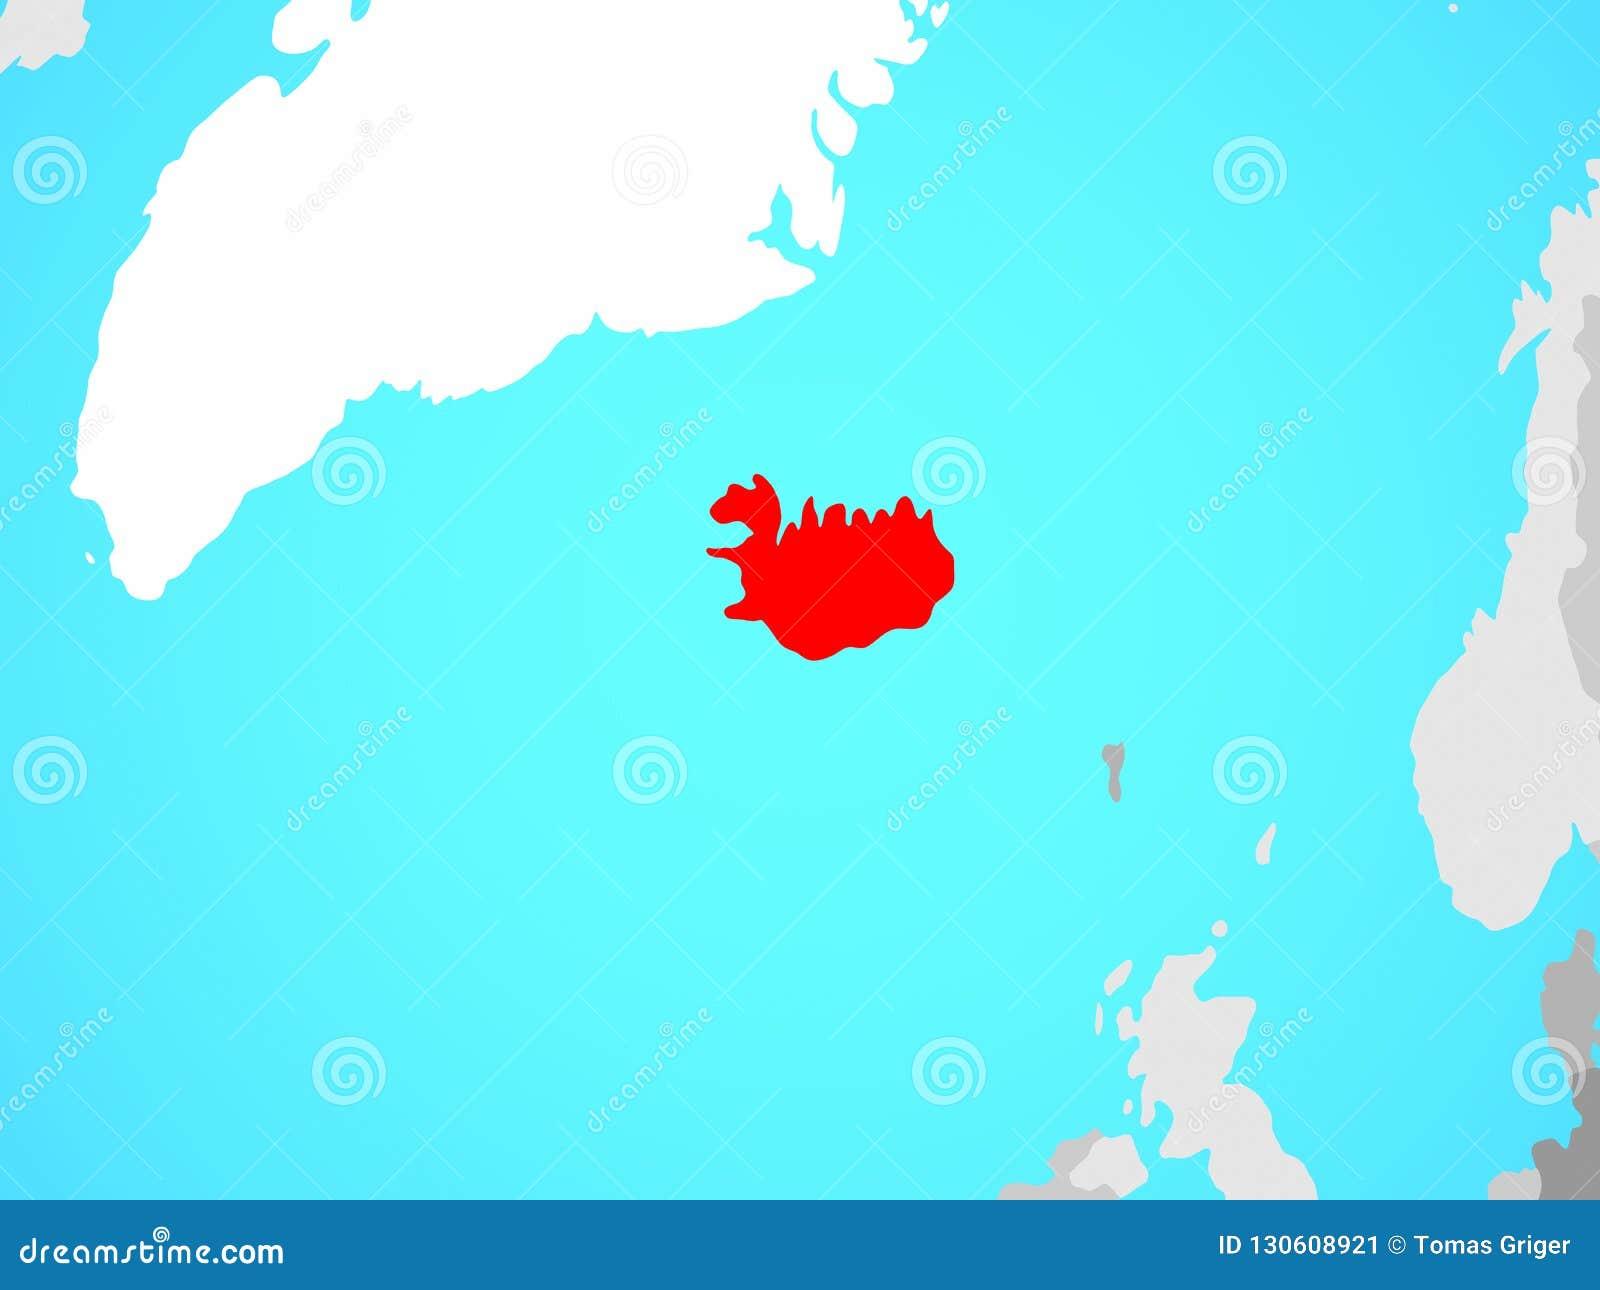 Iceland on map stock illustration. Illustration of iceland ... on great britain on map, greenland on map, japan on map, indonesia on map, germany on map, aleutian islands on map, new zealand on map, himalayan mountains on map, newfoundland on map, cuba on map, europe on map, cyprus on map, greece on map, liechtenstein on map, ireland on map, sardinia on map, denmark on map, montenegro on map, tibet on map, poland on map,